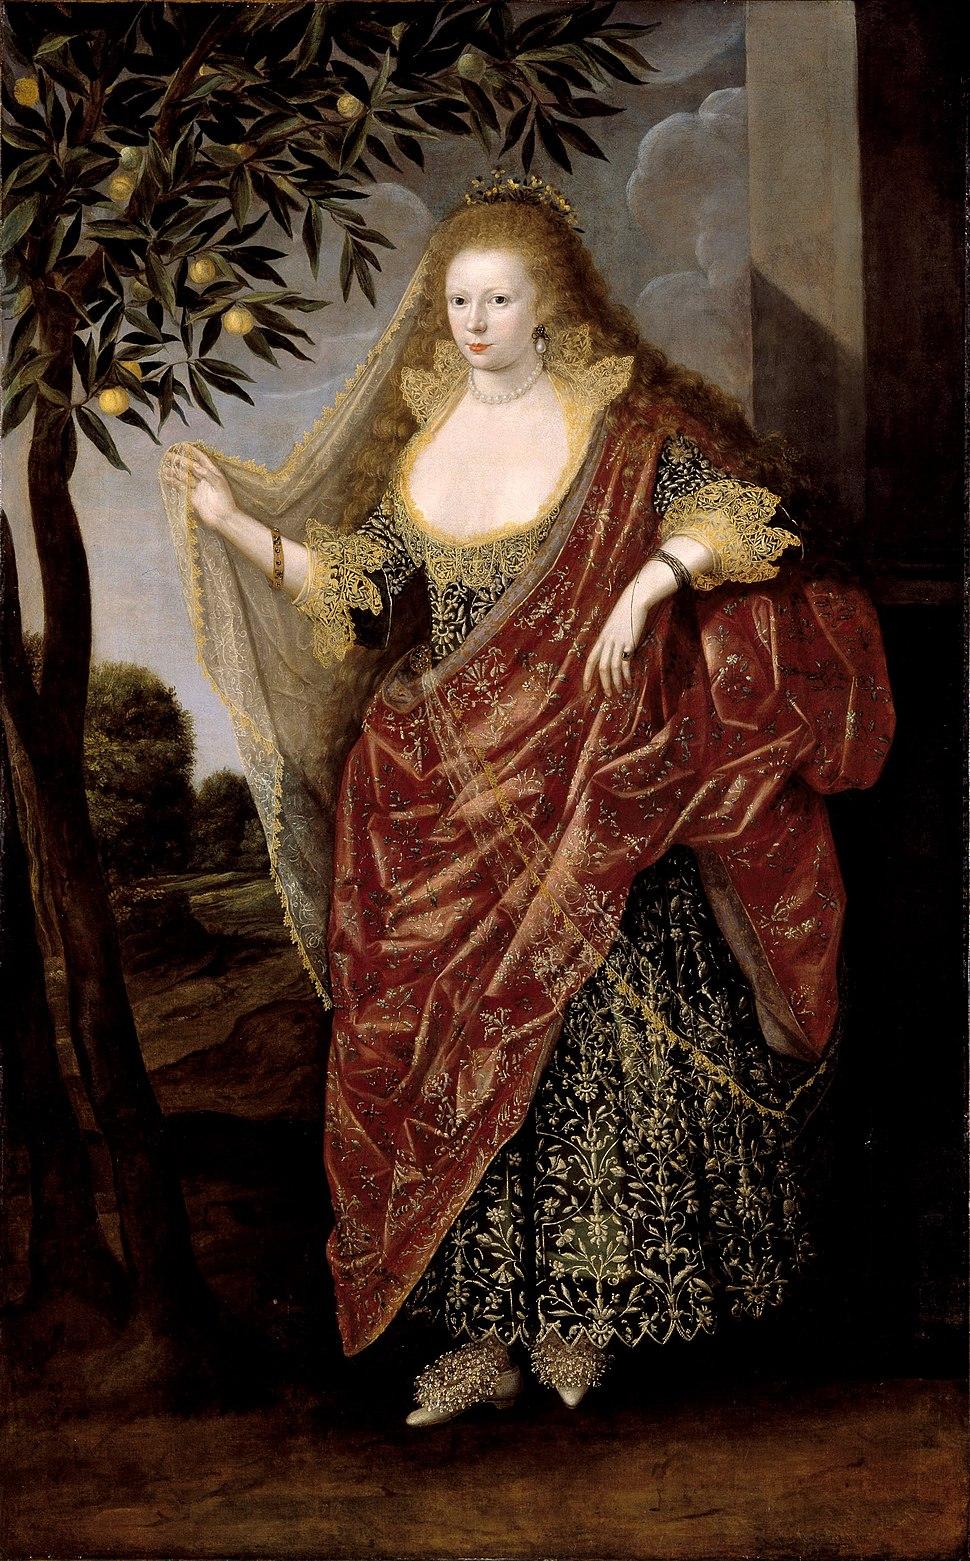 British School 17th century - Portrait of a Lady, Called Elizabeth, Lady Tanfield - Google Art Project